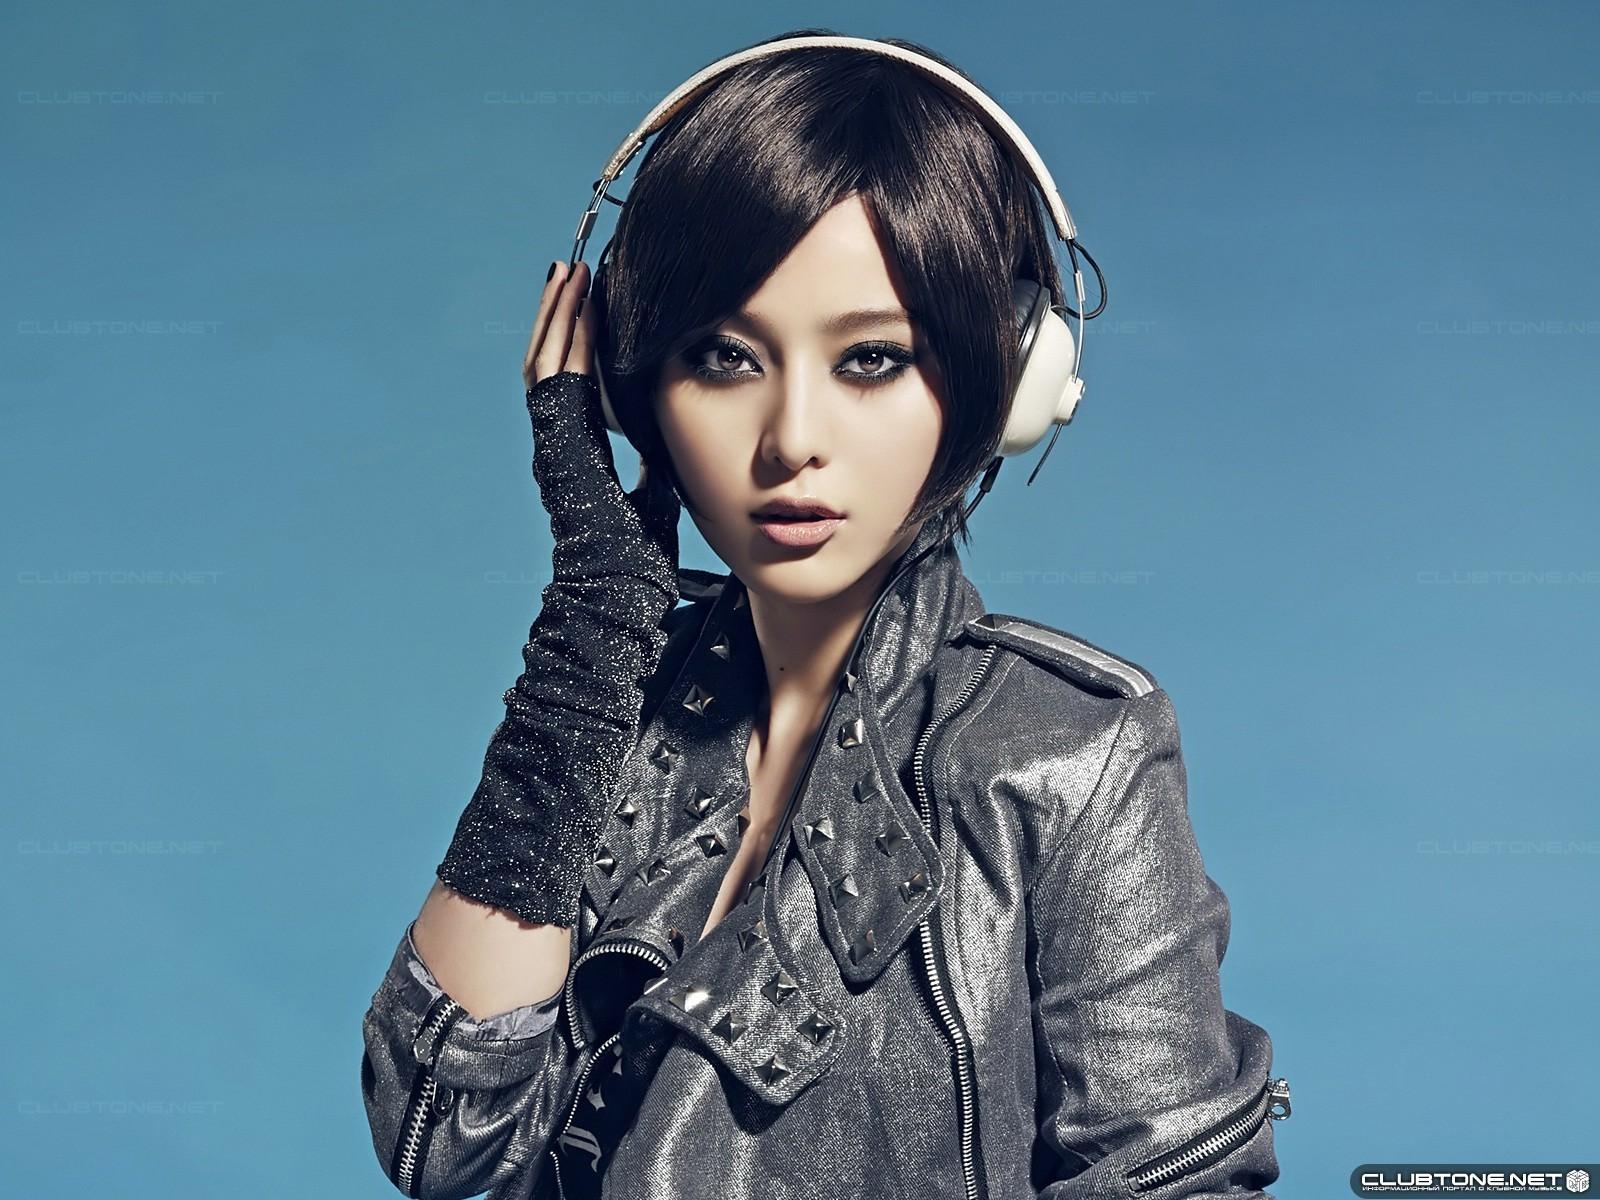 Wallpaper : face, women, model, singer, black hair, fashion